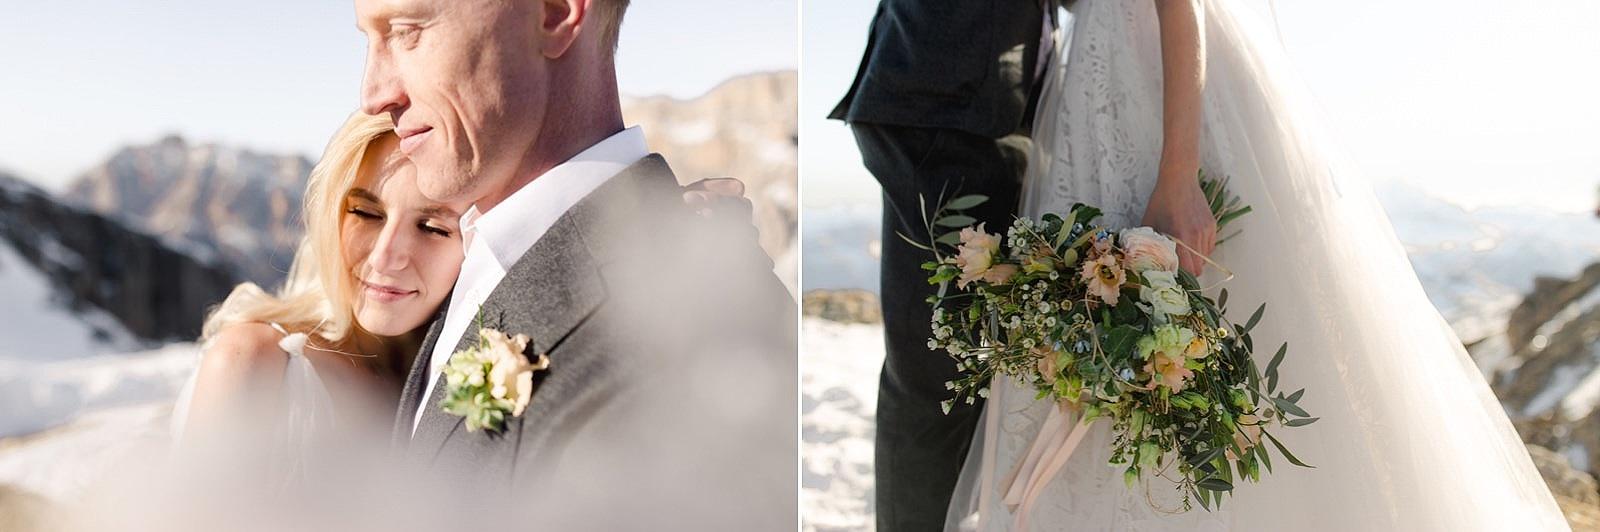 Adventurous+Dolomites+Elopement+Wedding+Fotomagoria39.jpg